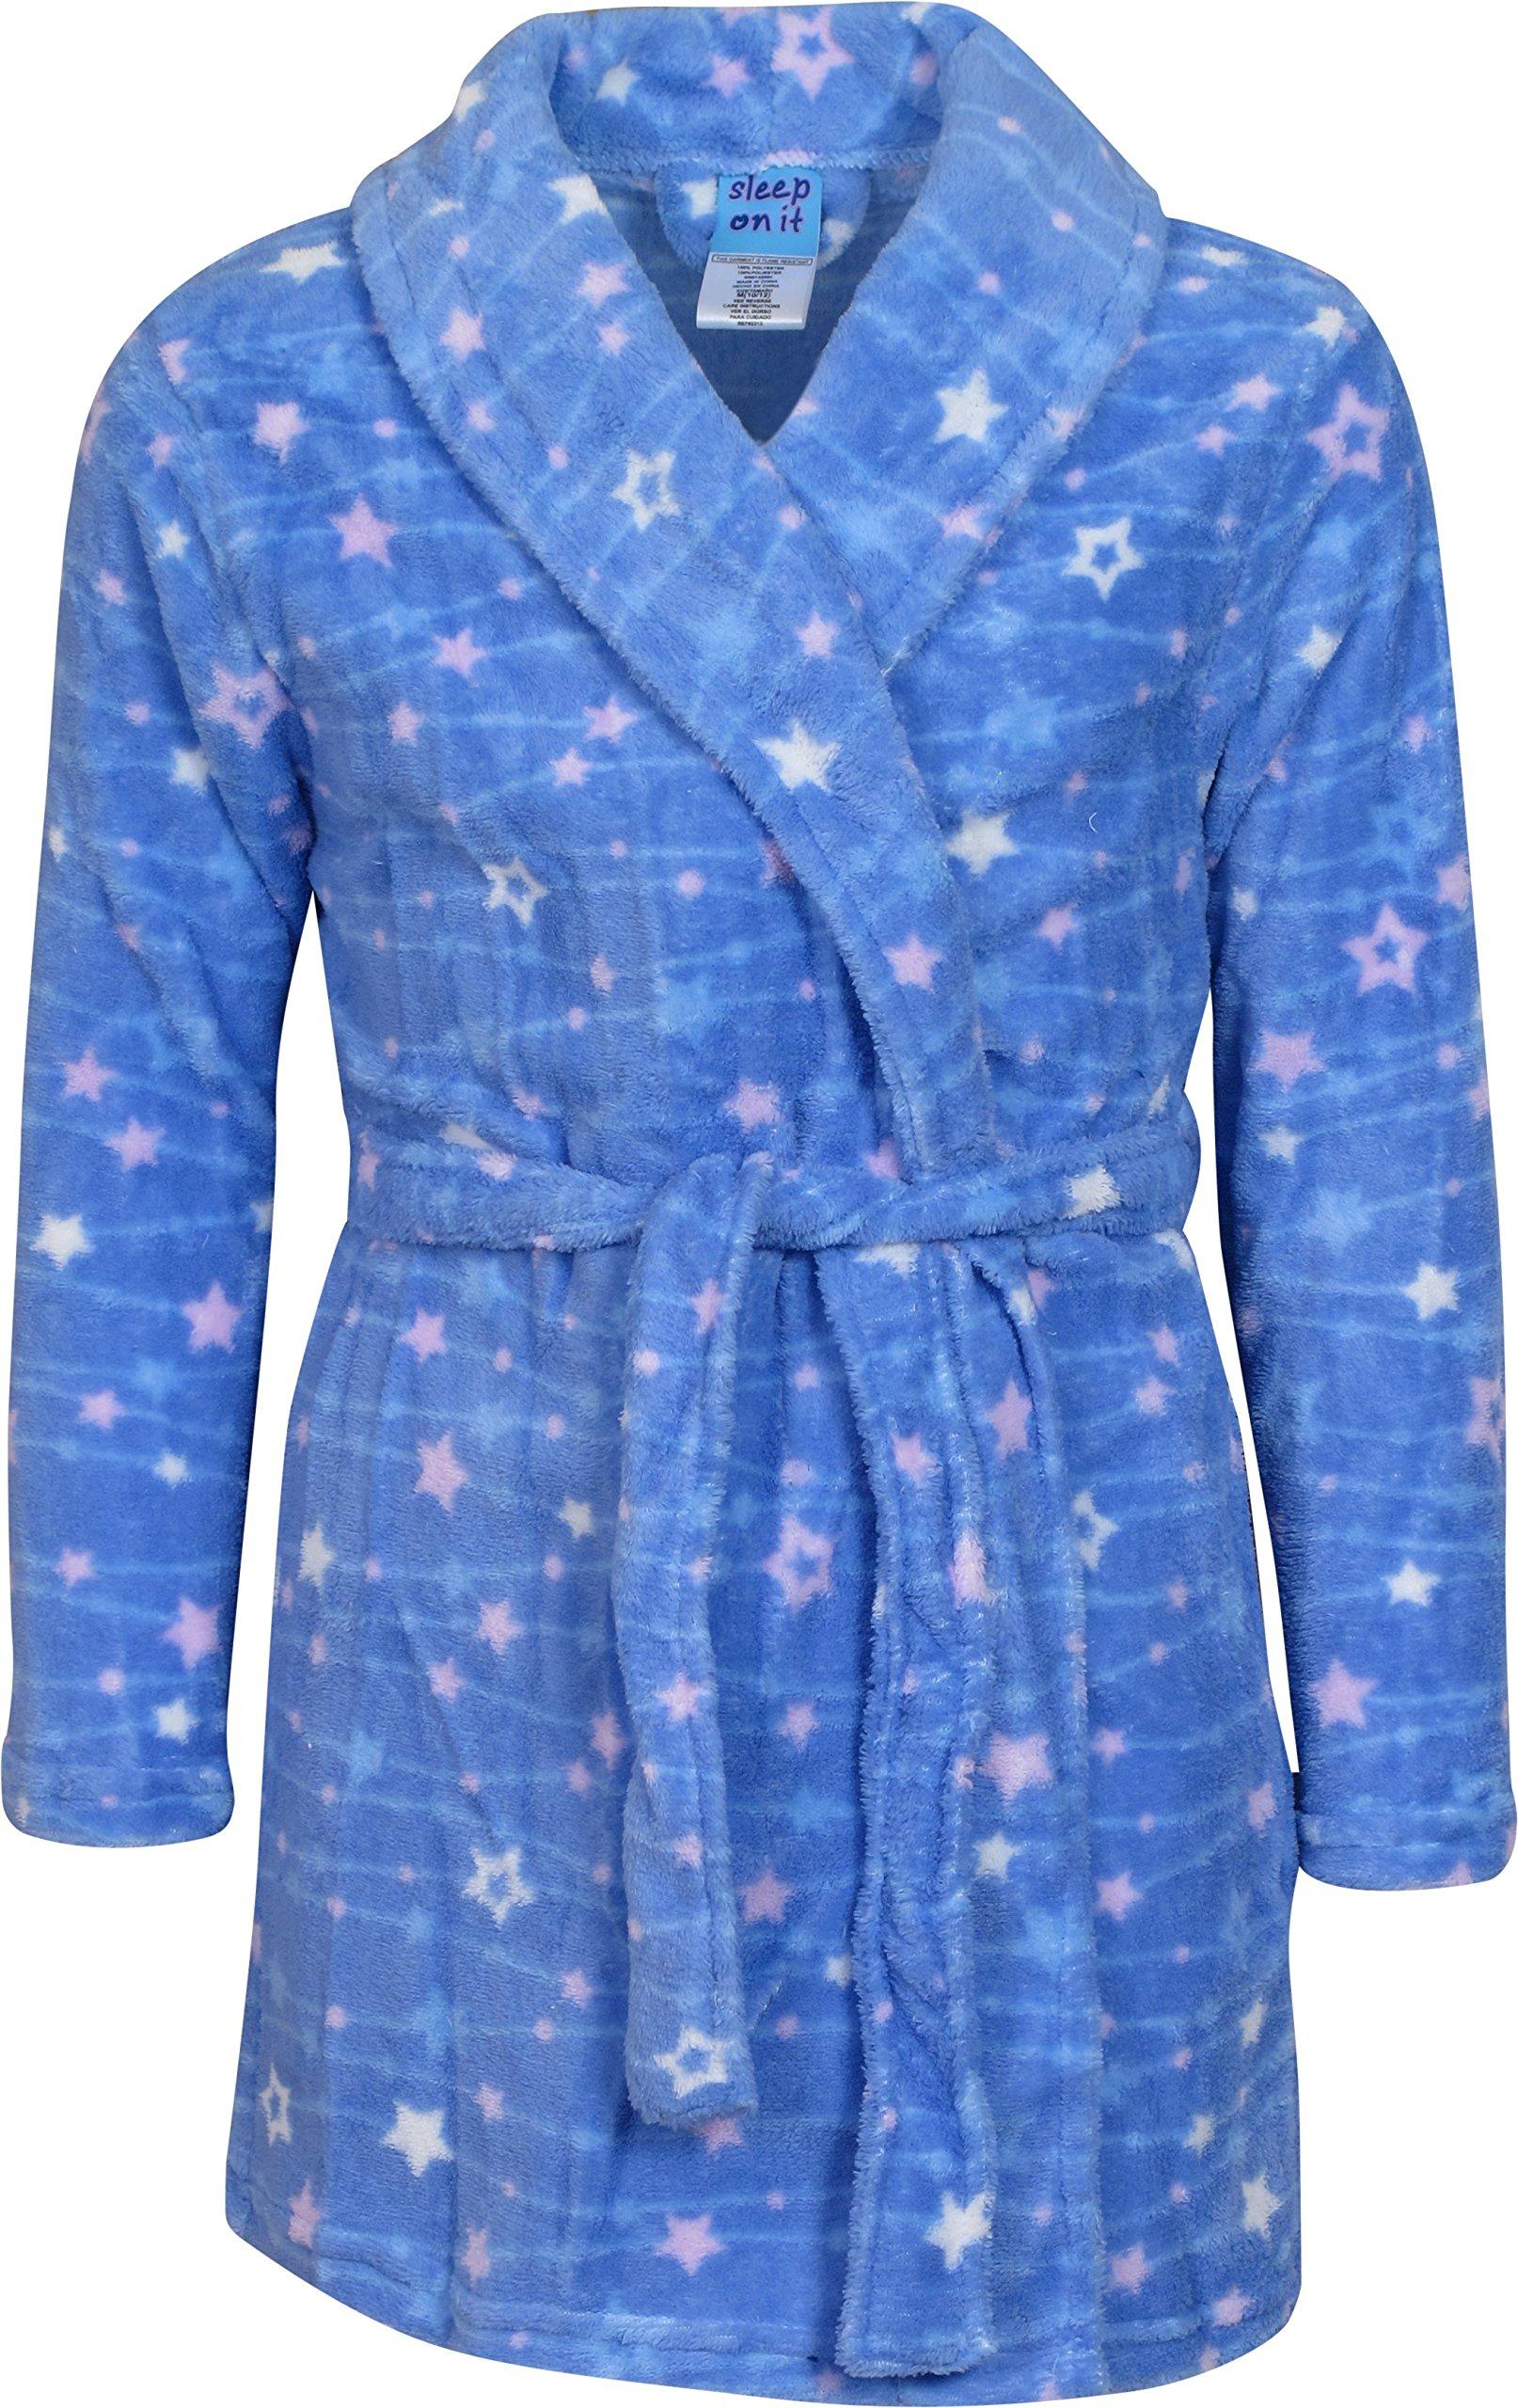 Sleep On It Girl's Coral Fleece Printed Medium Length Robe, Multi Stars, Size 7/8